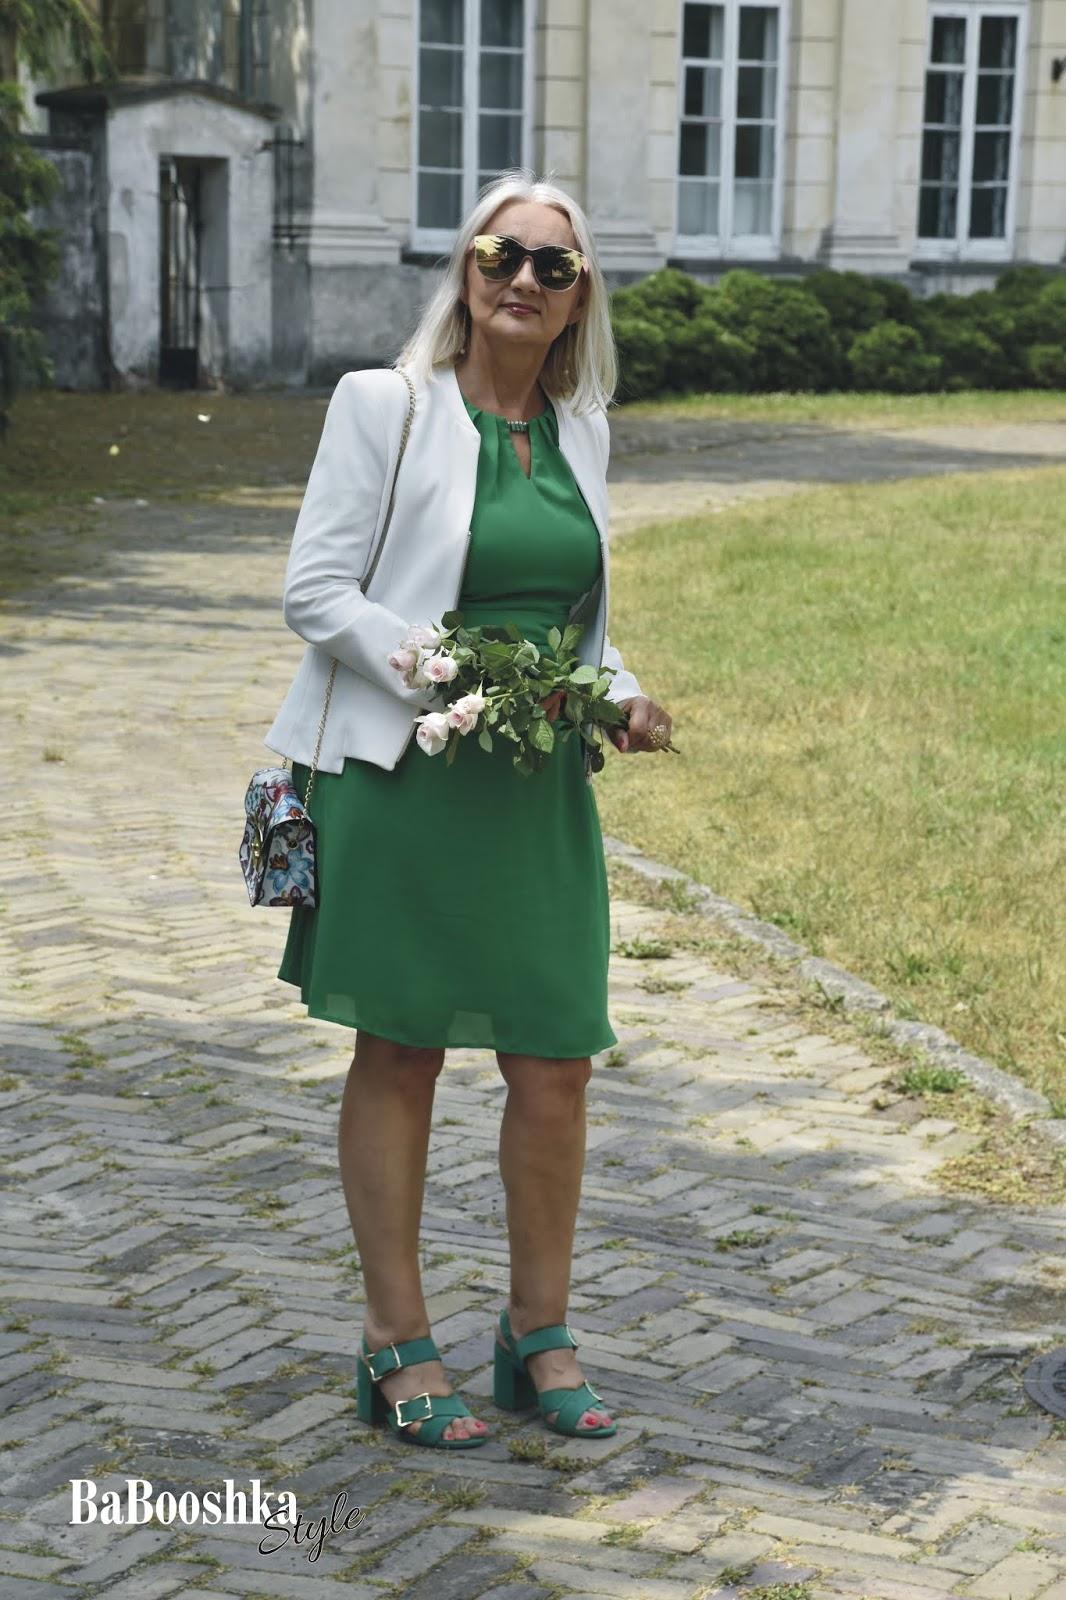 stylizacja na letnie wesele, Orsay, Babooshkastyle, stylistka, kodmody-stylistka, over45plus, over50plus, #fashionblogger50,